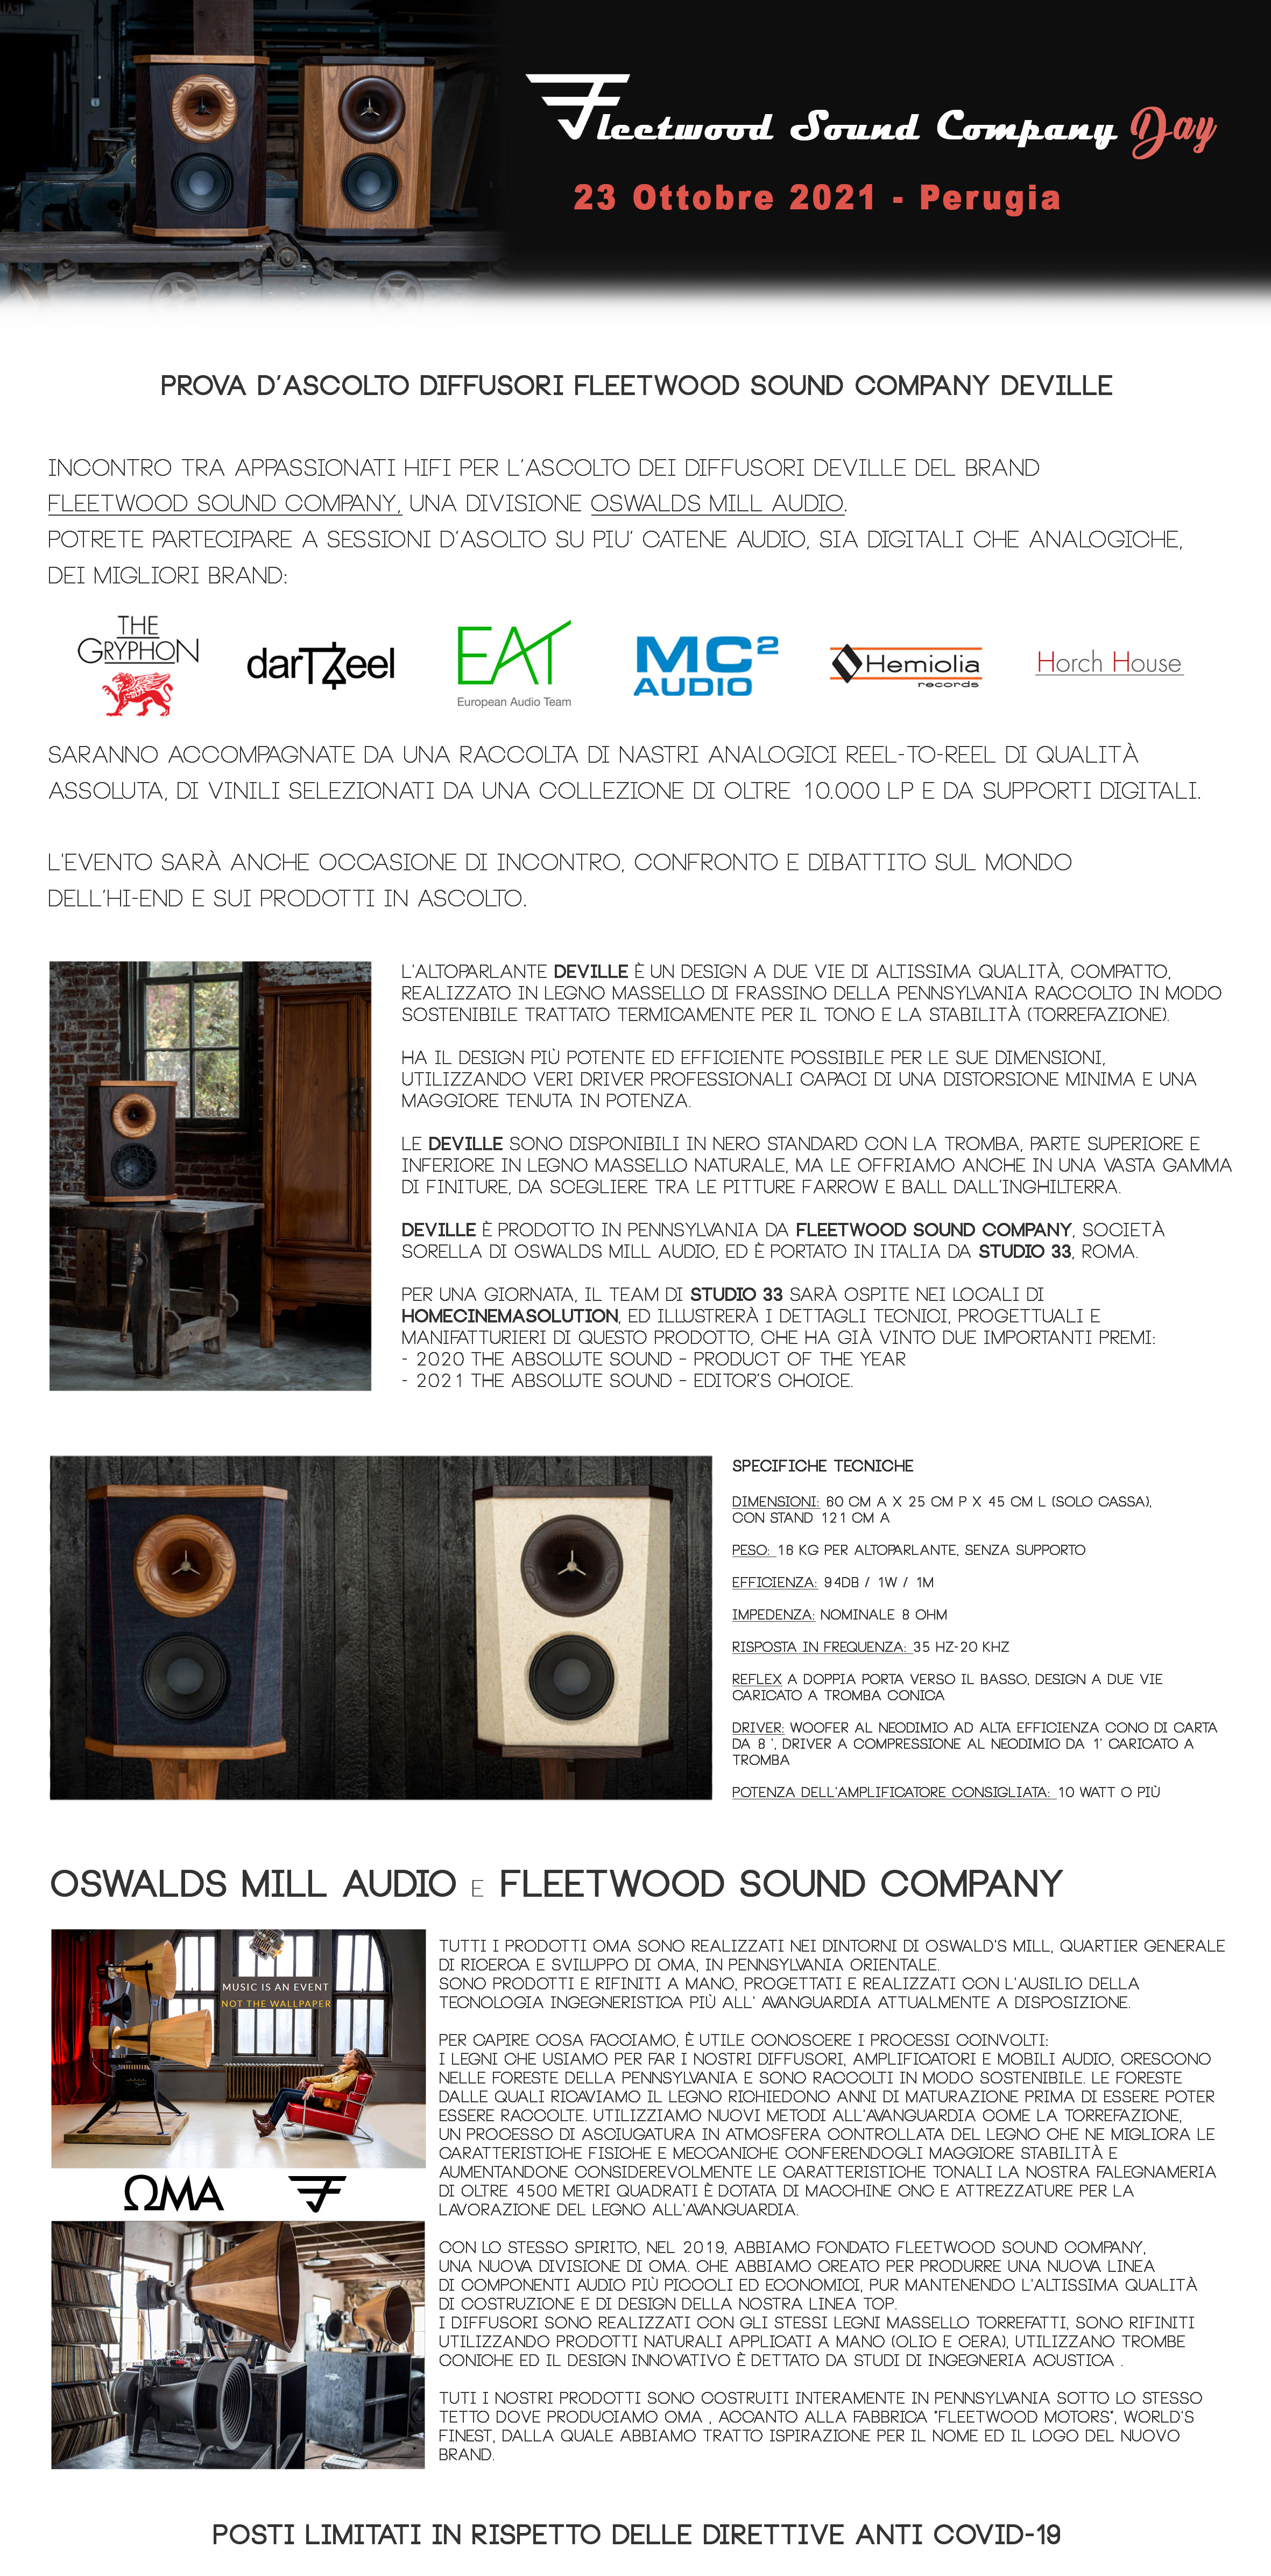 Evento Perugia 23 Ottobre 21 - Fleetwood Deville